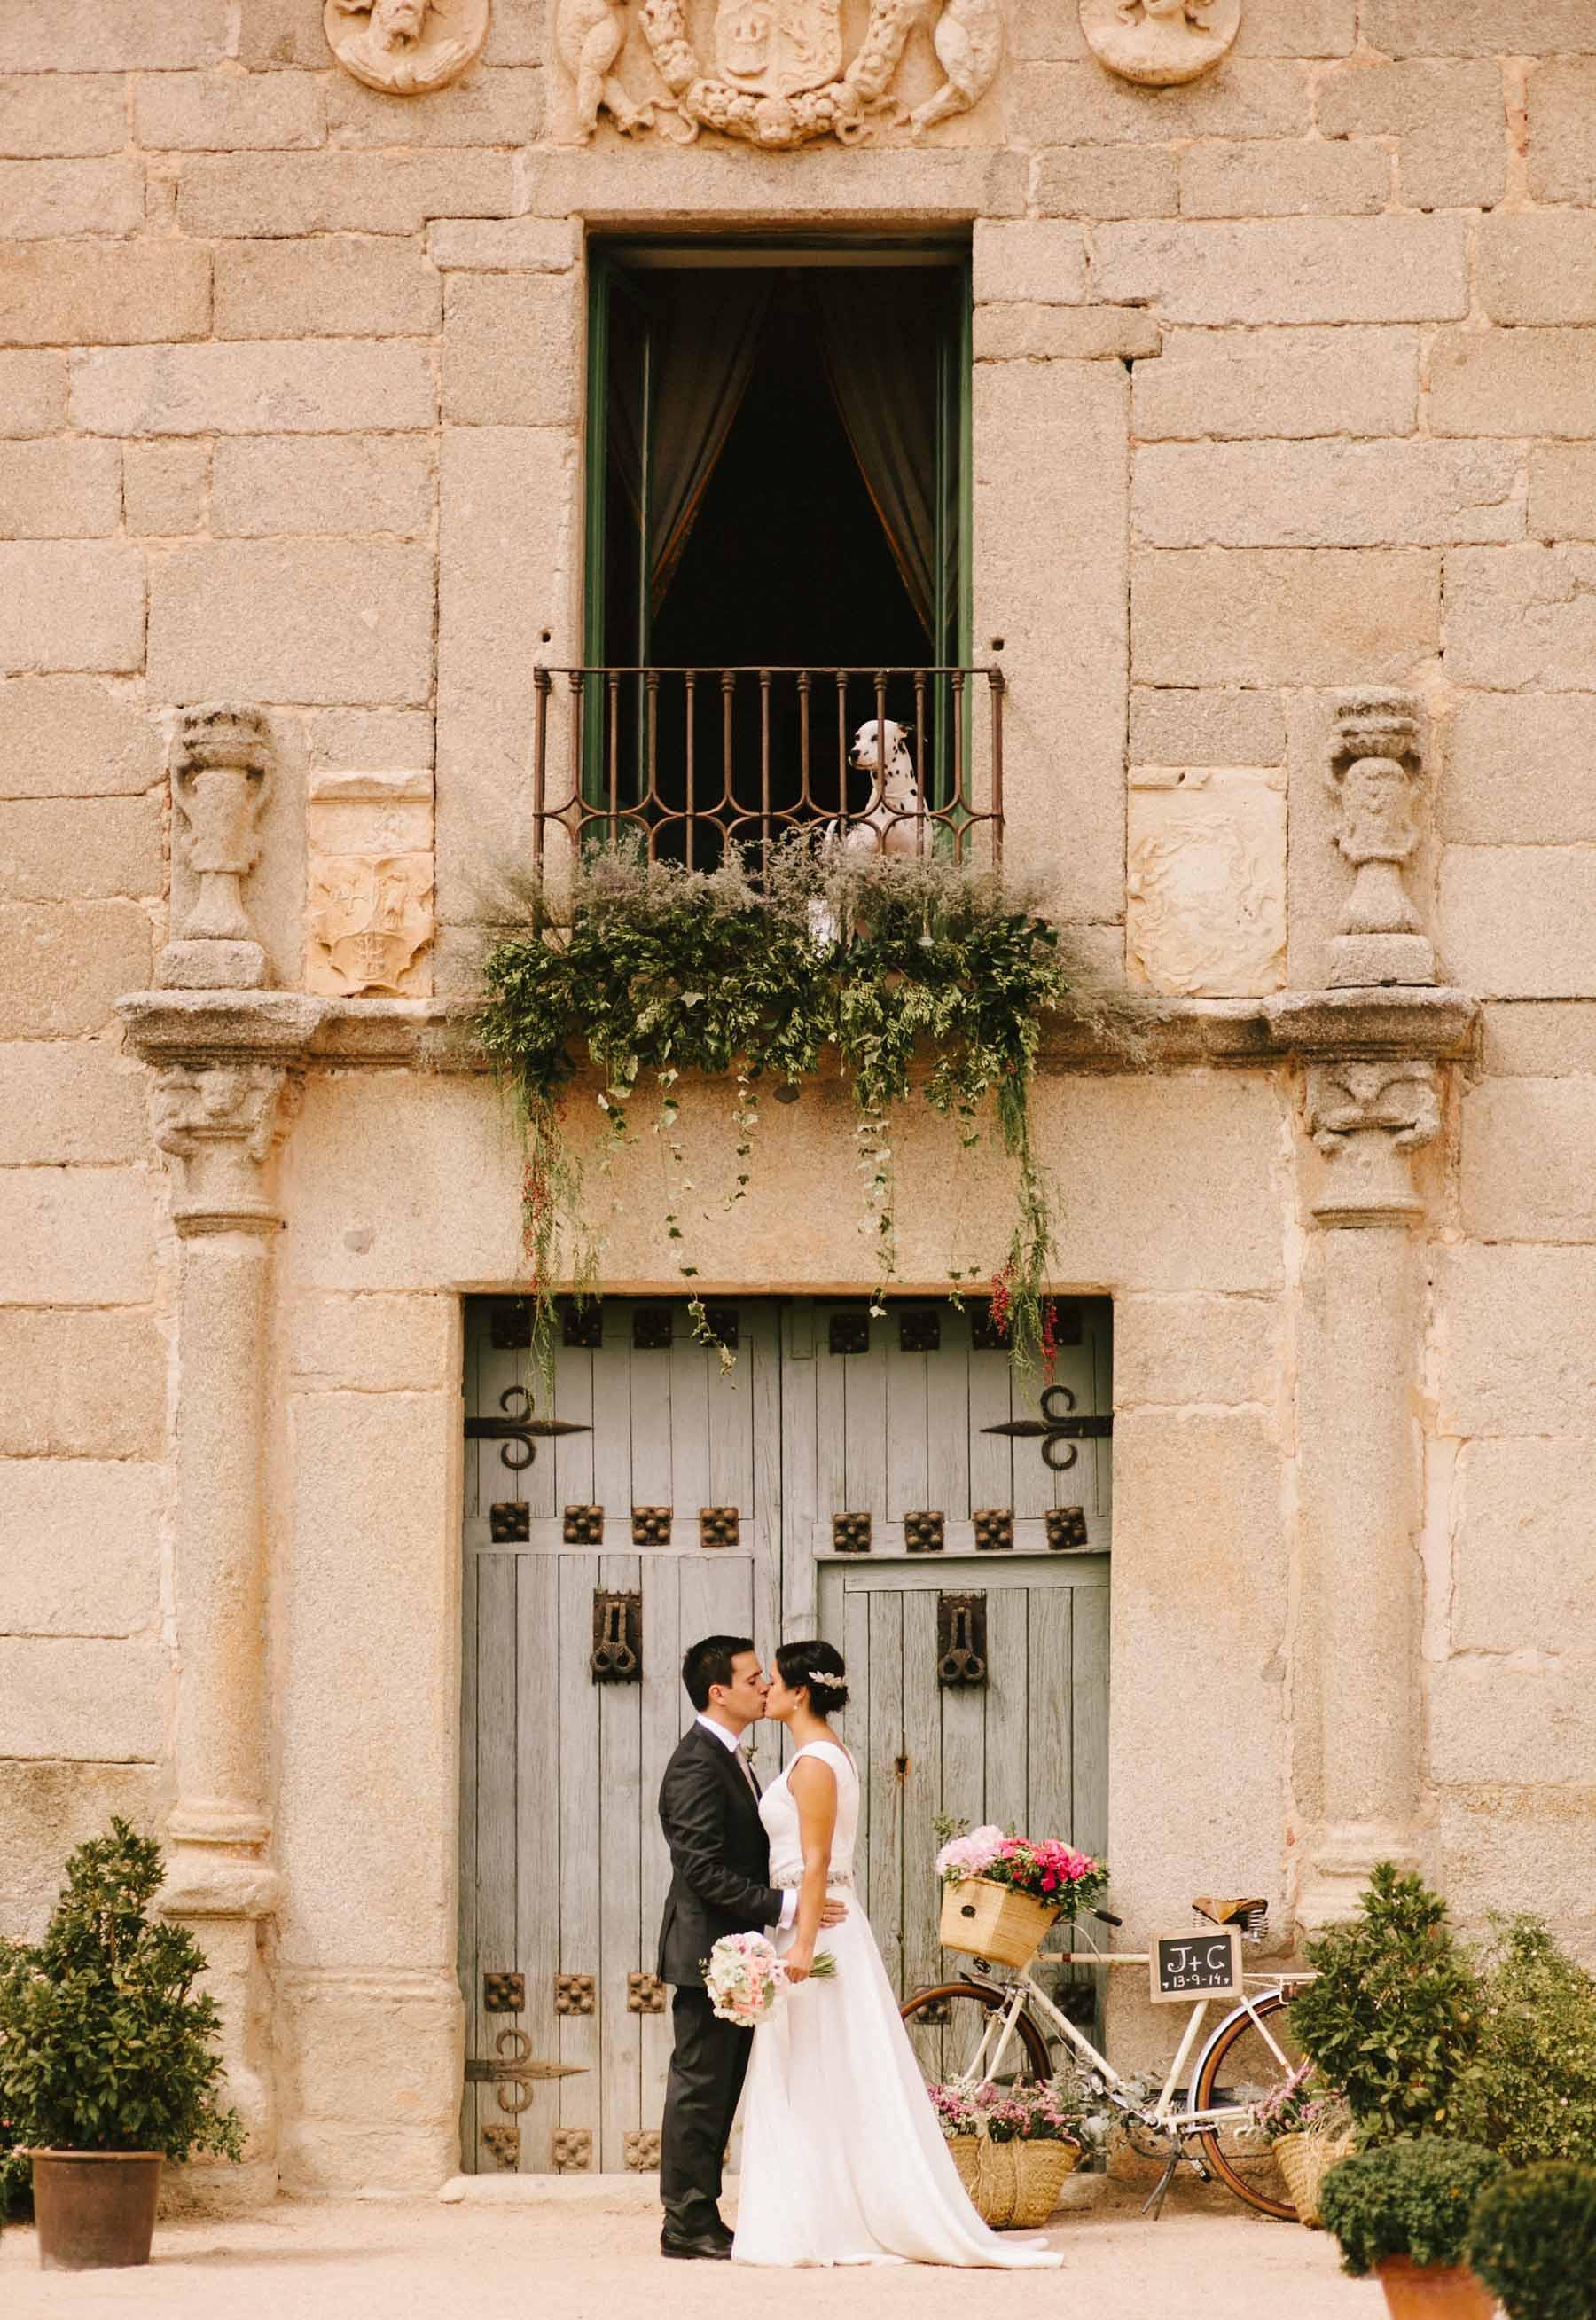 fotografo de bodas Jairo Crena-68